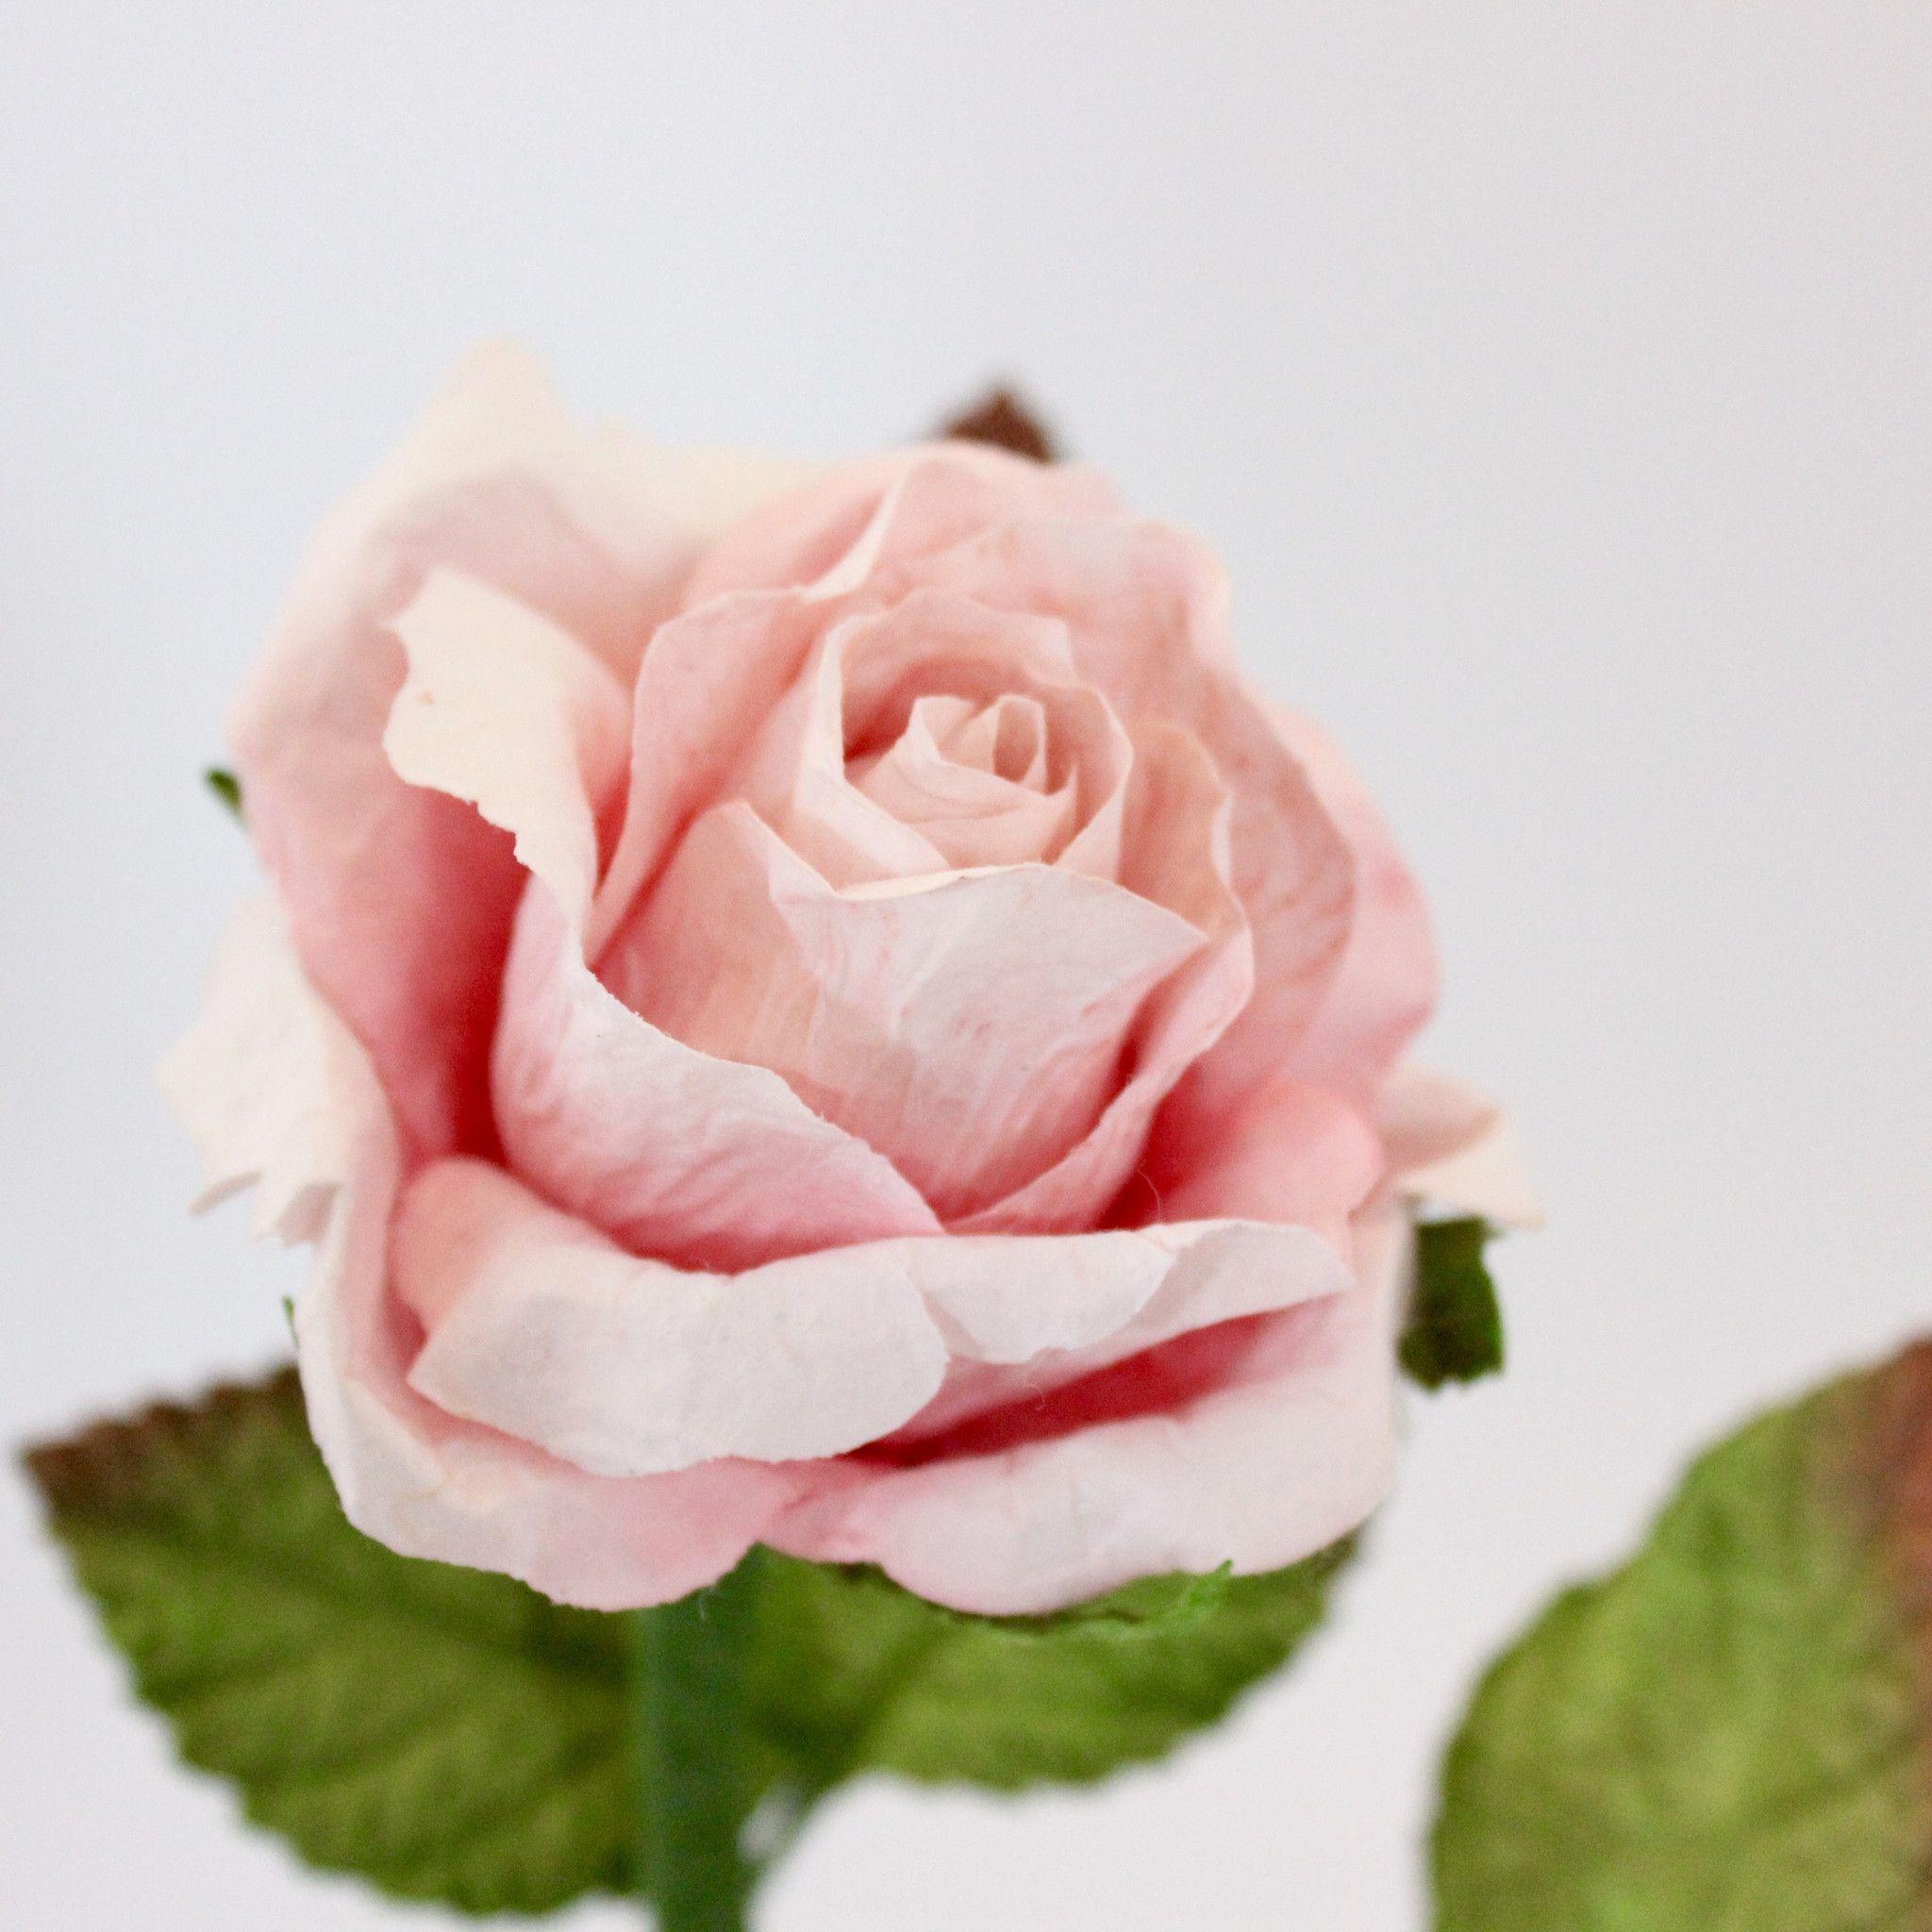 Long stemmed paper rose medium light pink paper flowers australia long stemmed paper rose medium light pink paper flowers australia mightylinksfo